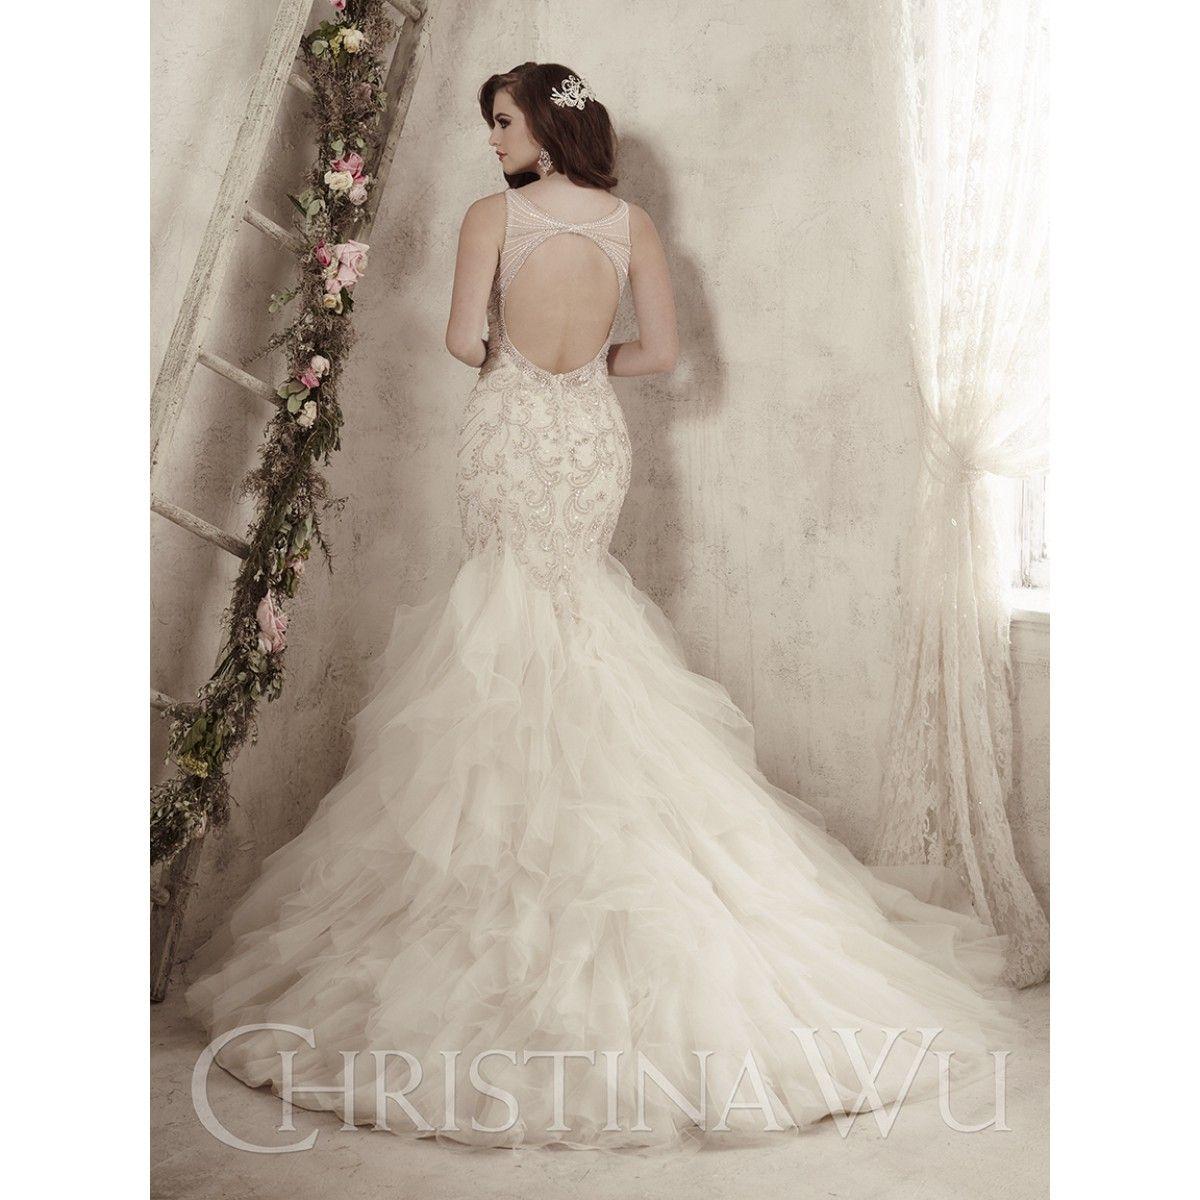 Christina wu wedding dresses  Christina Wu Style   Christina Wu  Bridal  Wedding Dresses